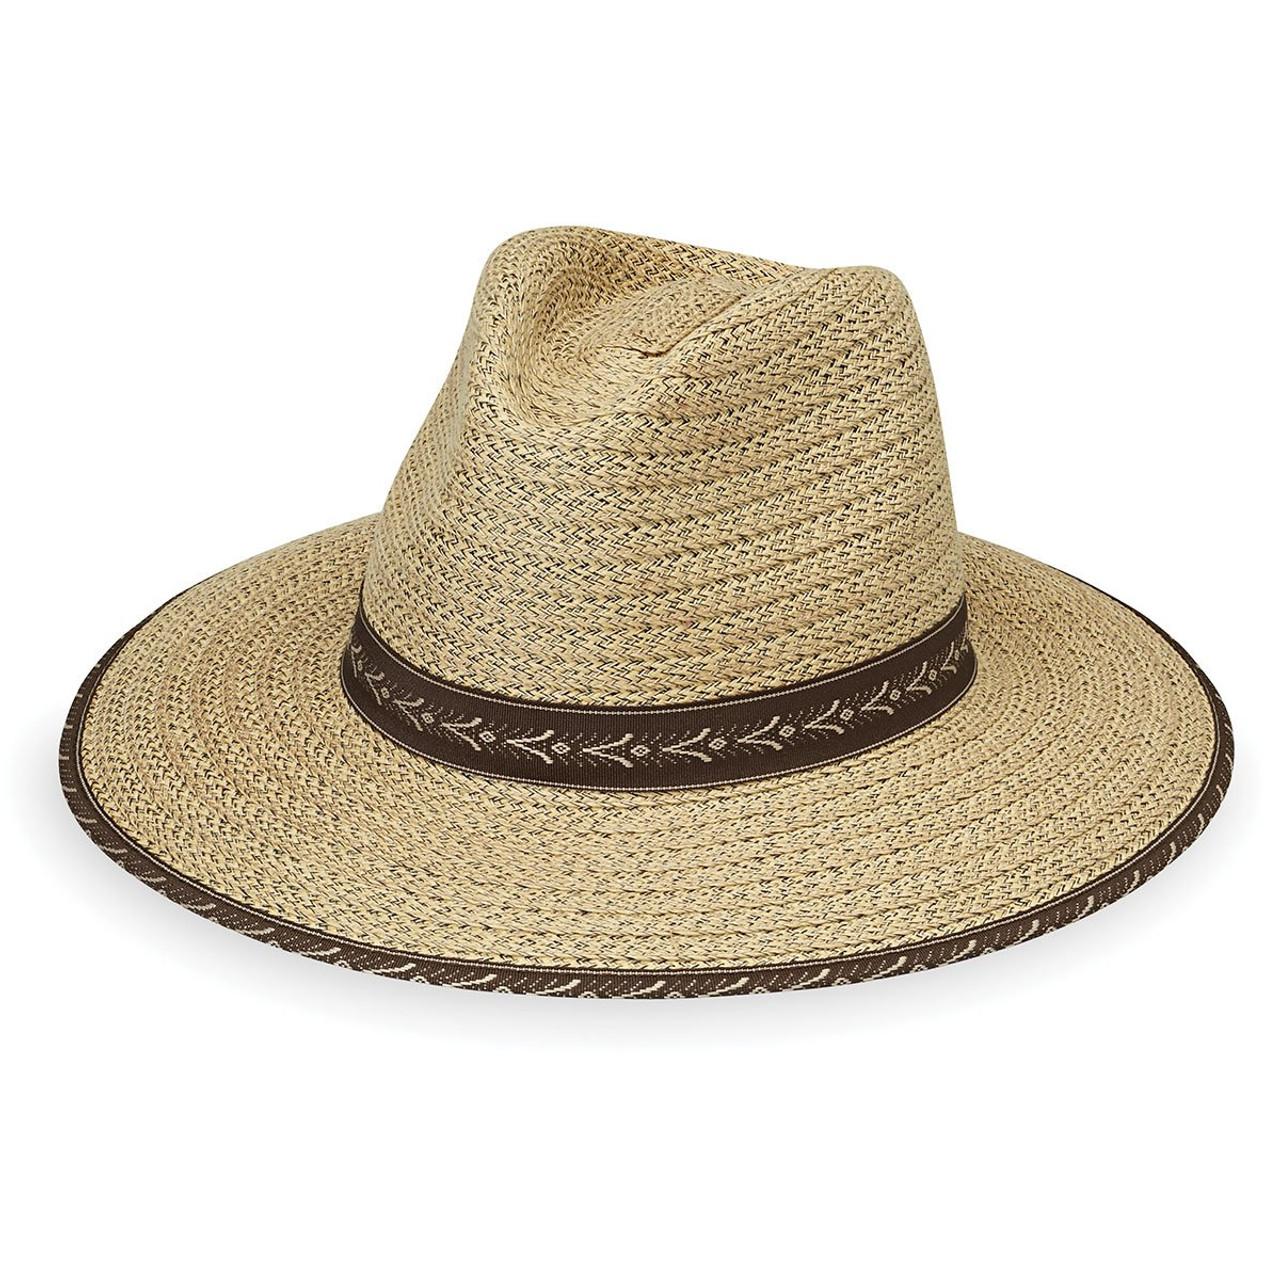 8ed0efc05ee339 Men's Wallaroo UPF50+ Cabo Surf Style Sun Hat | Mens Fedora Hats